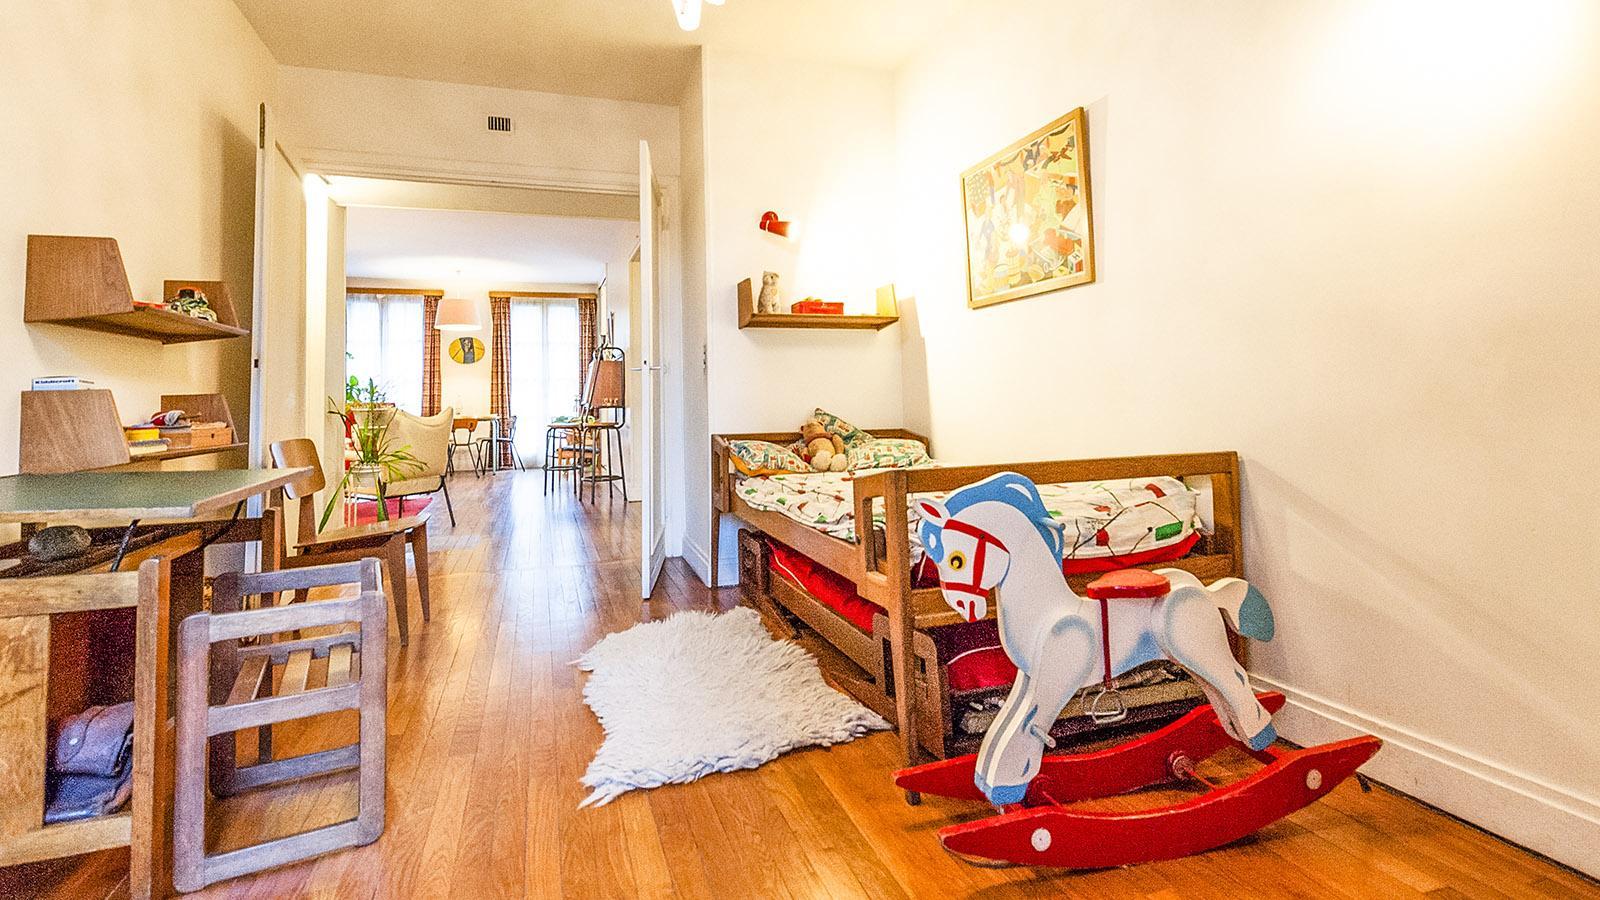 Appartement Témoin: : das Kinderzimmer. Foto: Hilke Maunder